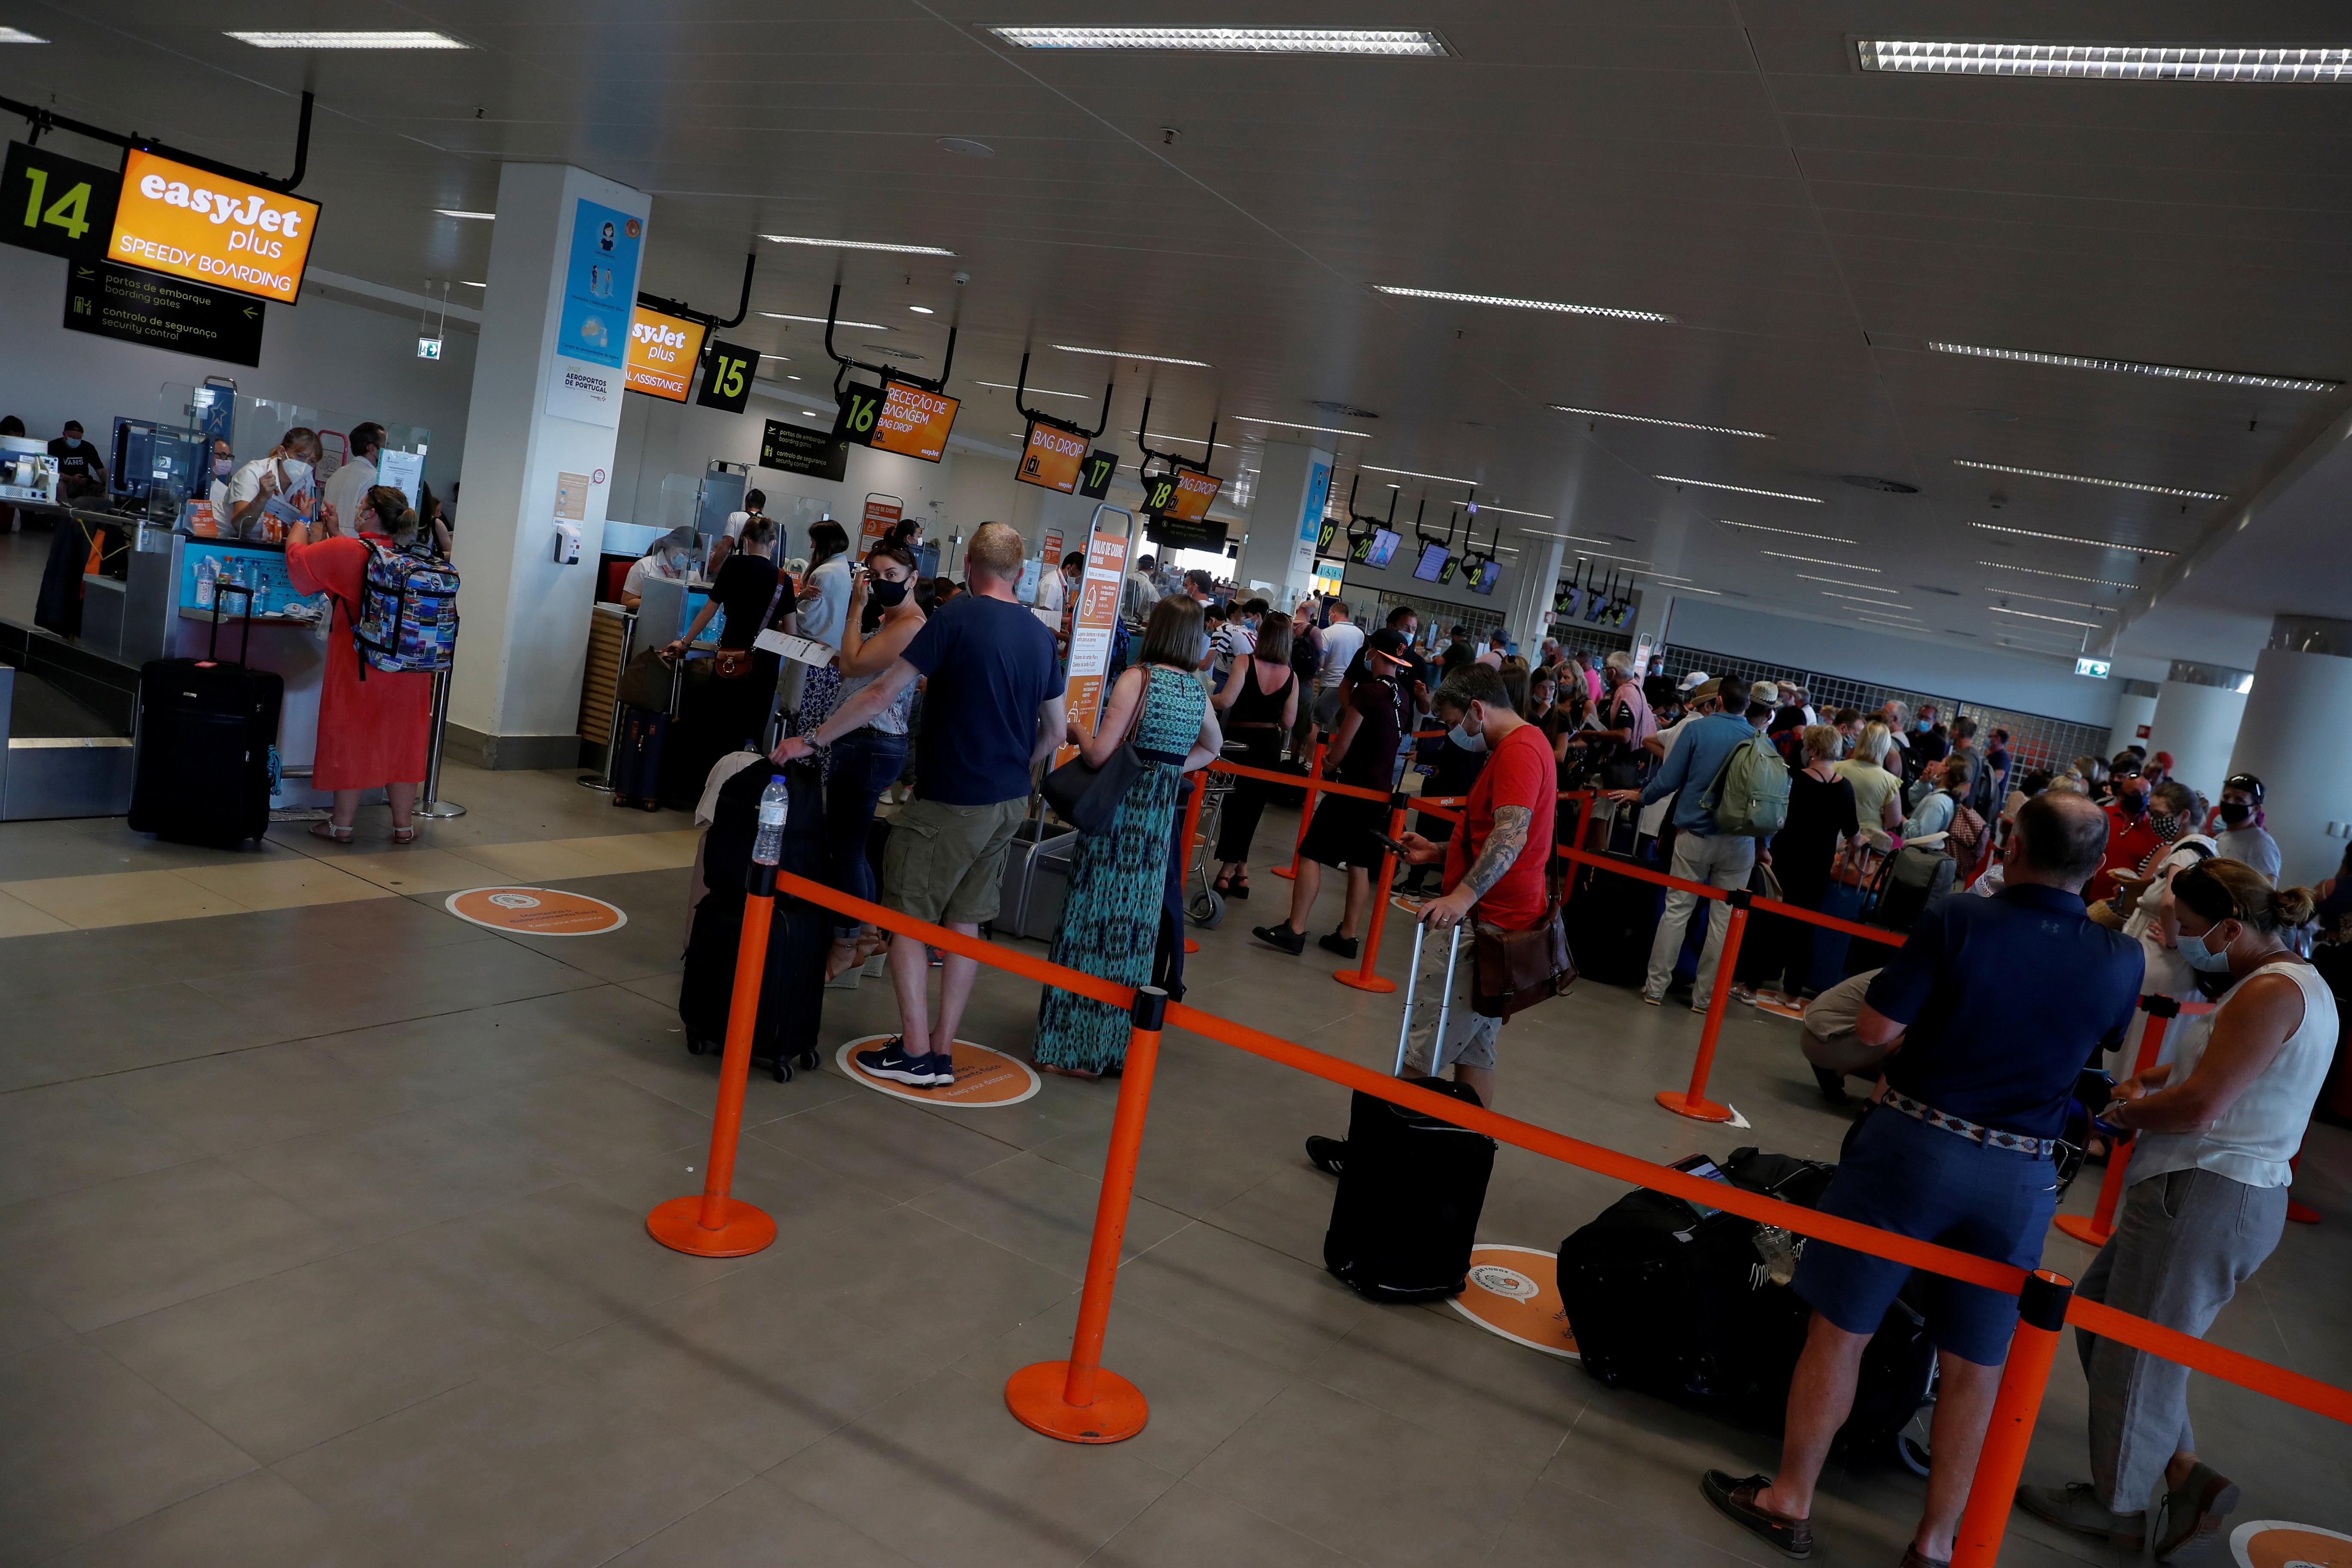 People wait in queues at Faro airport amid the coronavirus disease (COVID-19) pandemic, in Faro, Portugal, June 6, 2021. REUTERS/Pedro Nunes/File Photo